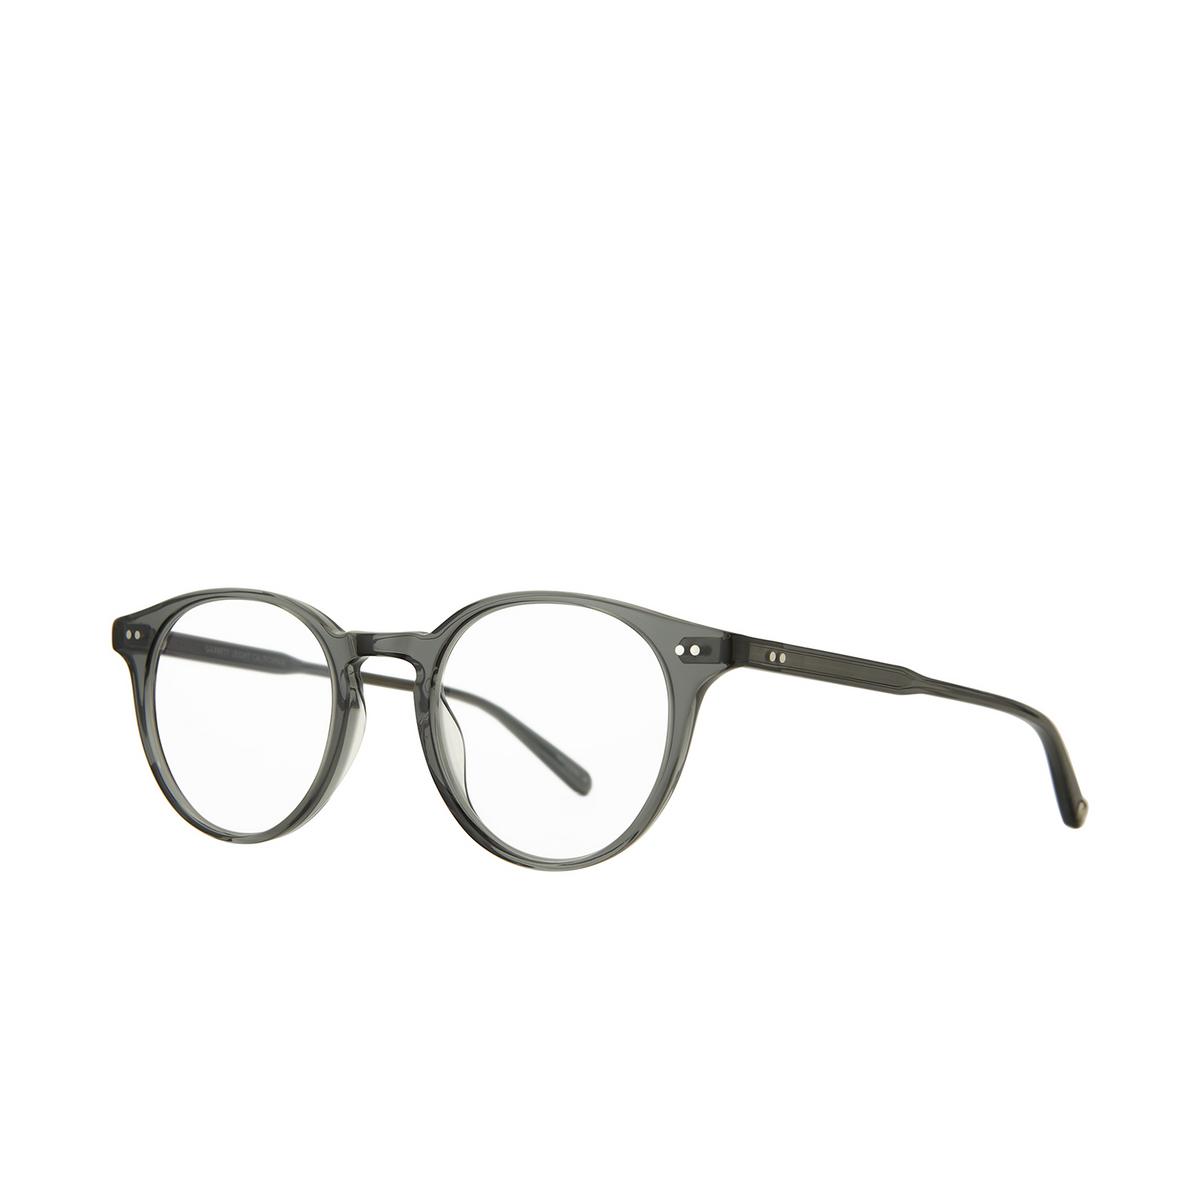 Garrett Leight® Round Eyeglasses: Clune color Sea Grey Sgy - three-quarters view.